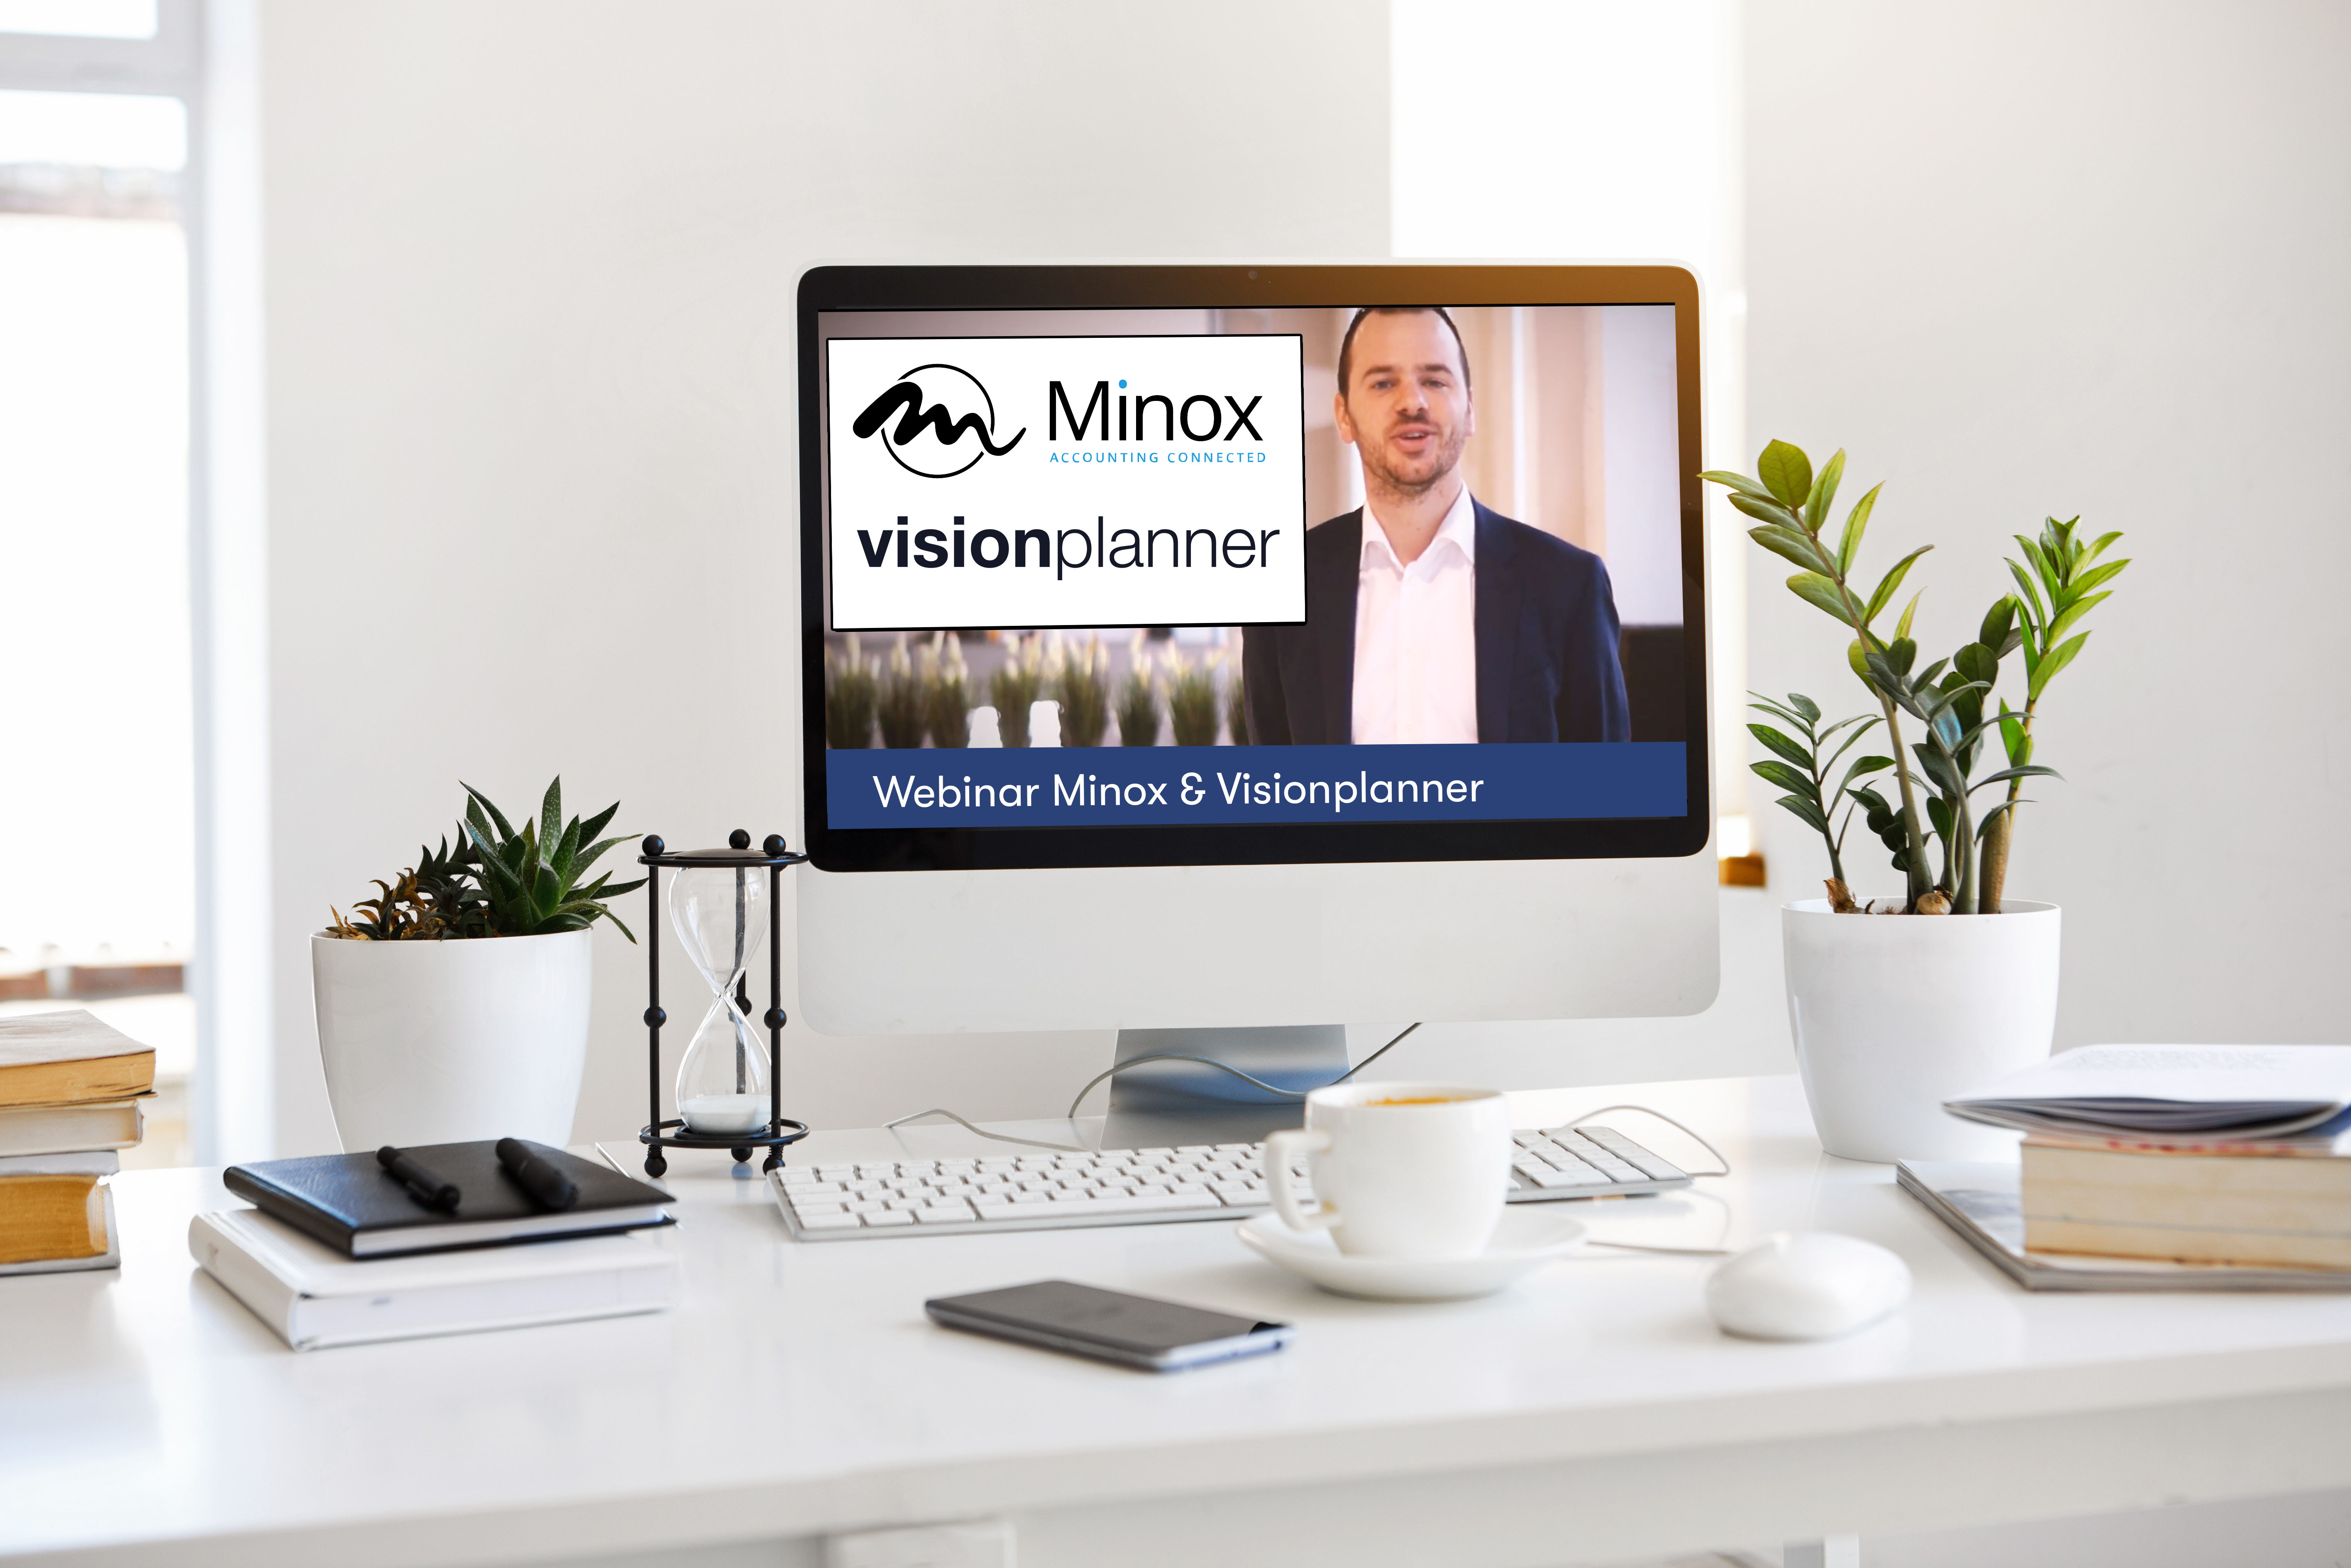 webinar Minox